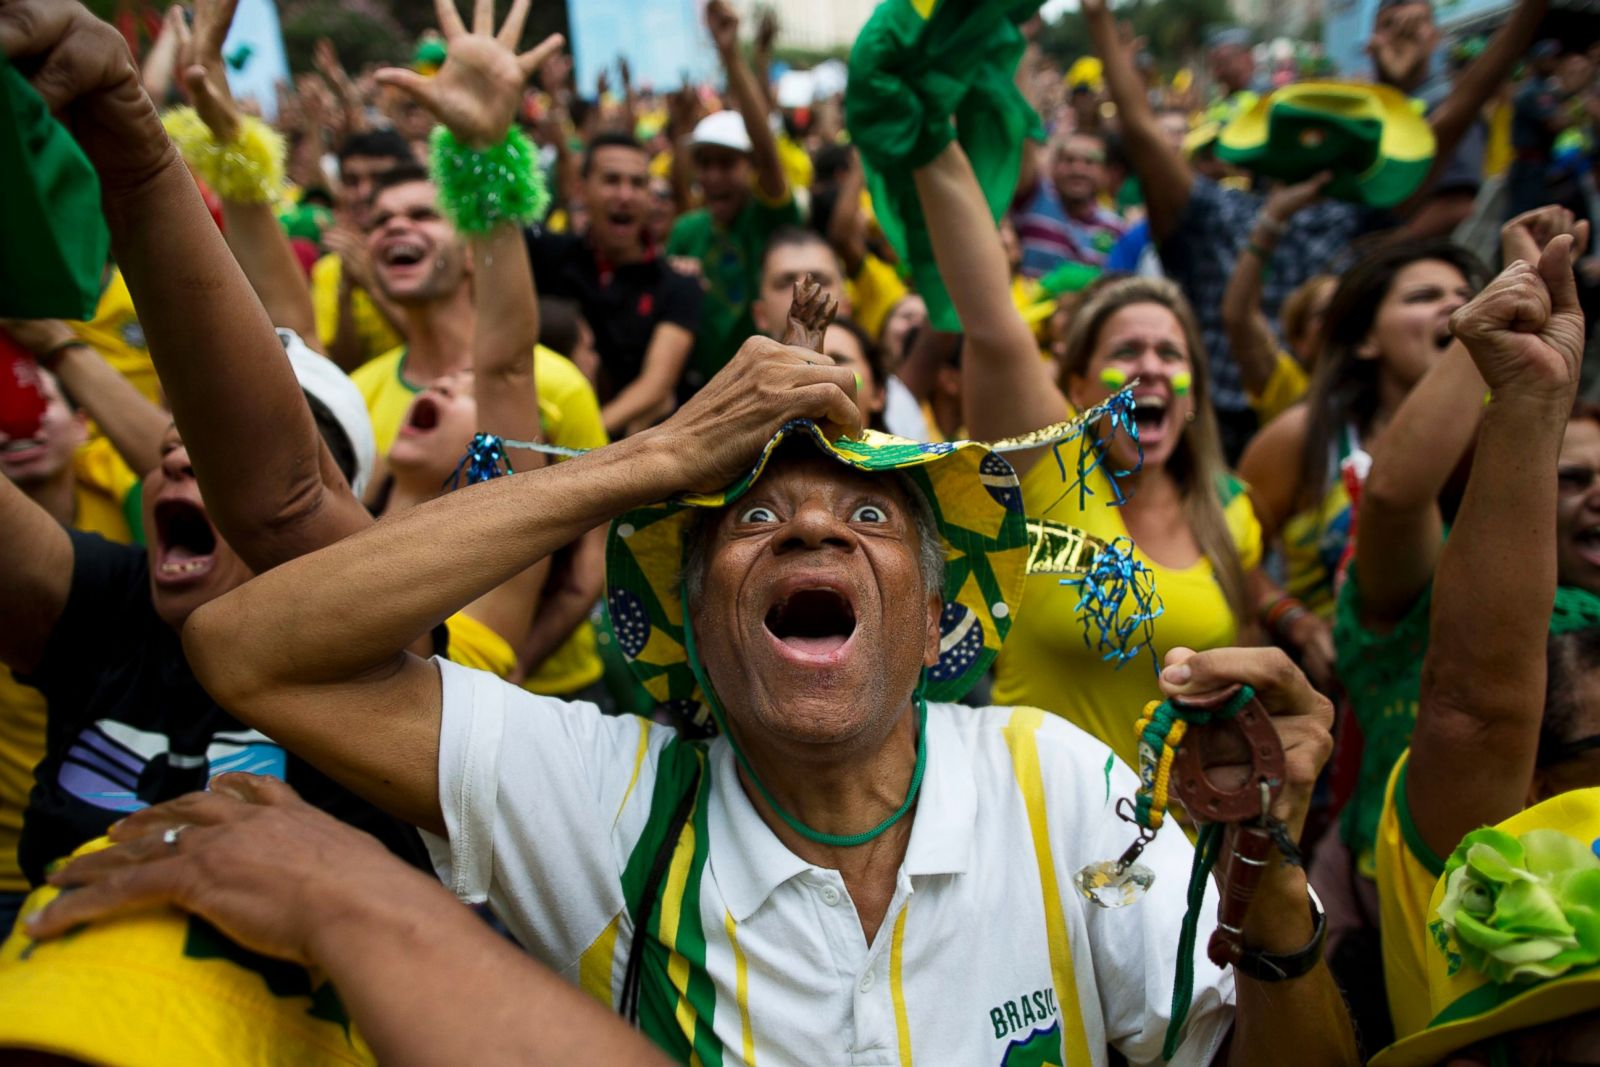 Brazil world cup fans pity